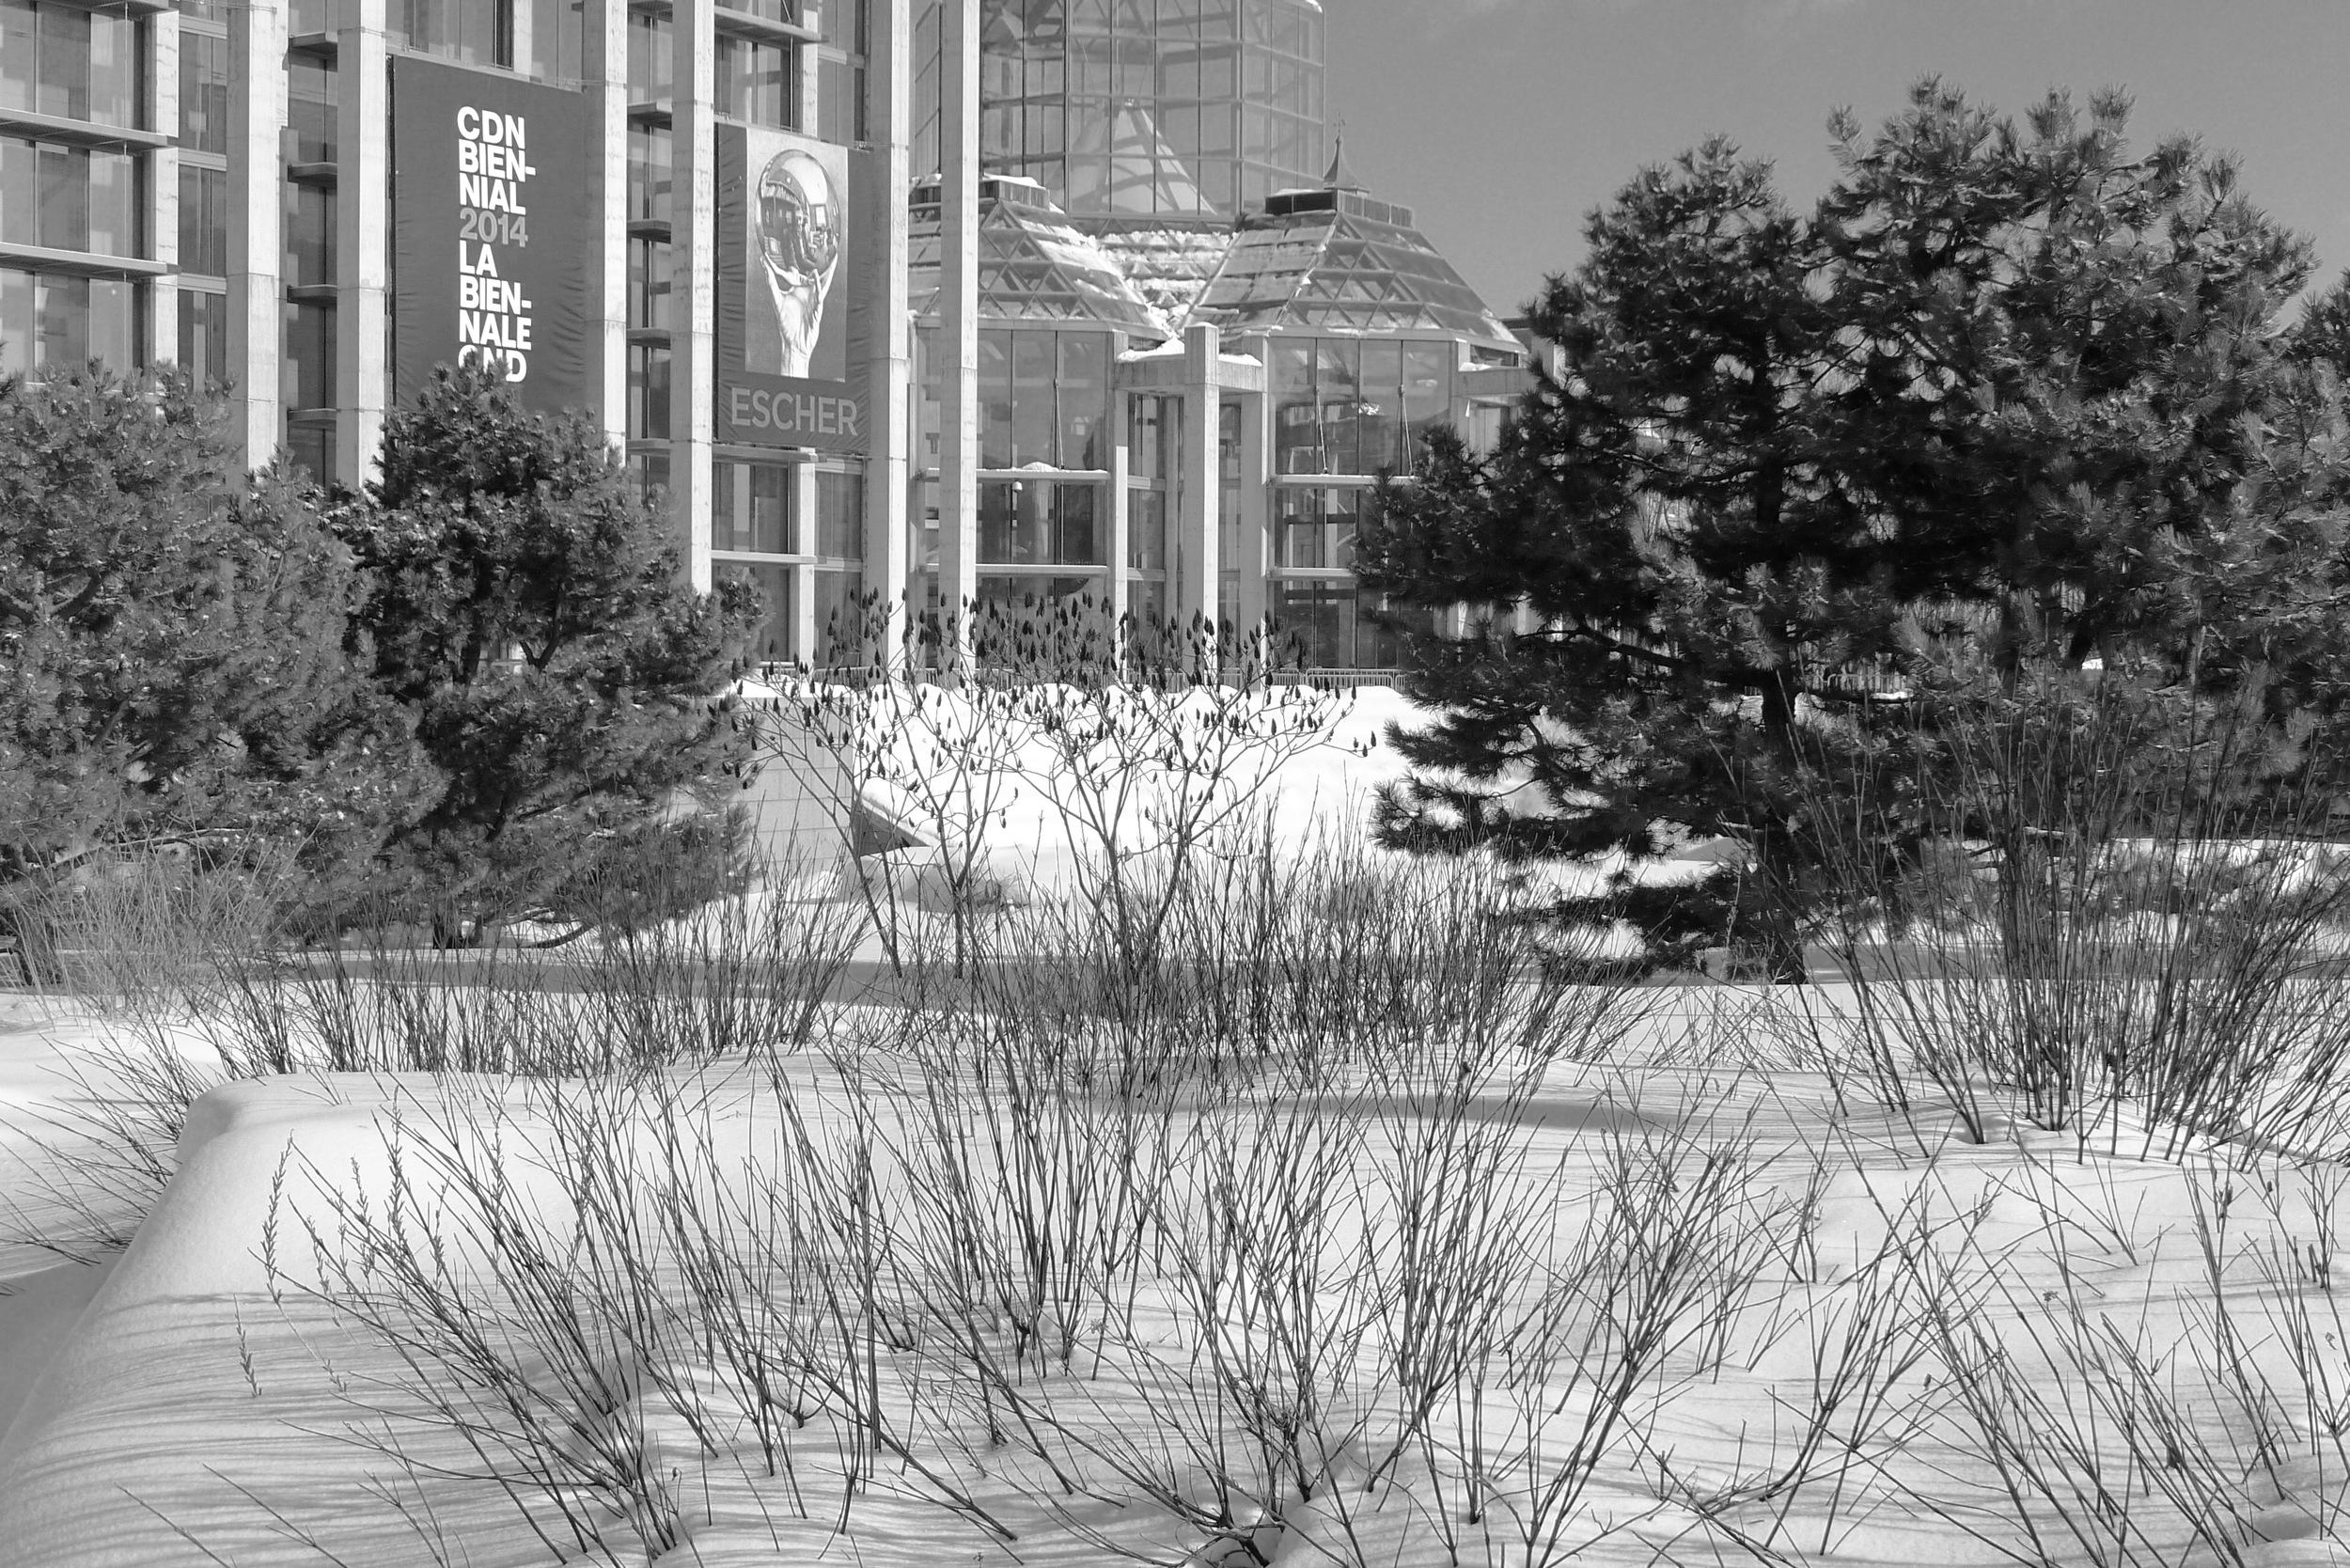 Taiga garden at the National Gallery, Ottawa